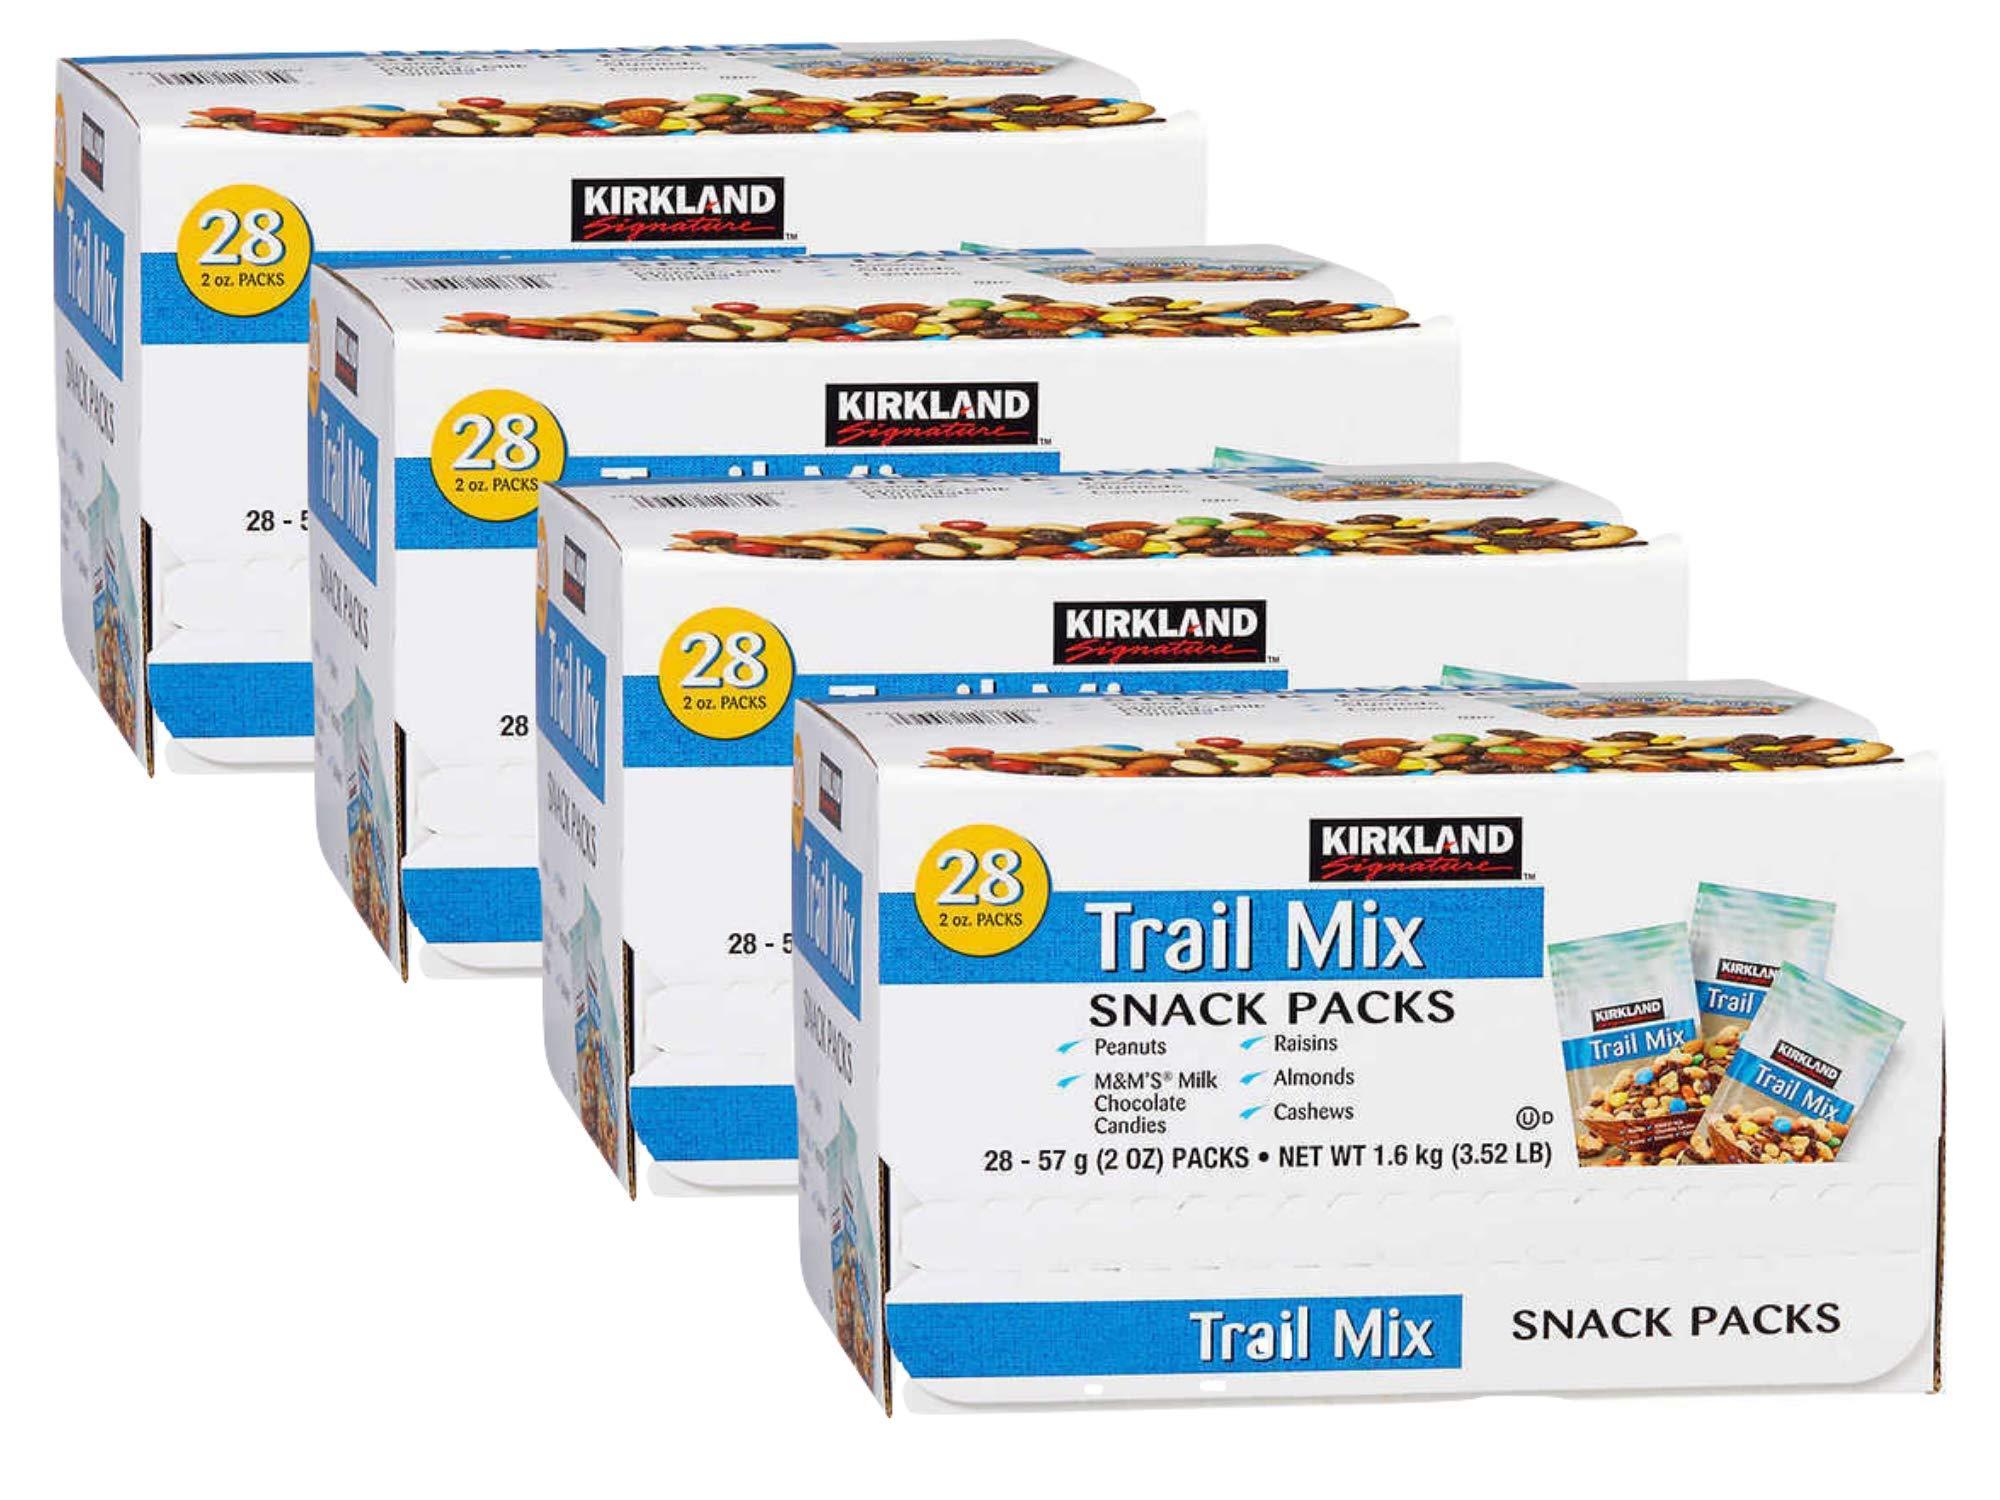 Kirkland Signature Trail Mix - 28 count, 3.52 lb box (Pack of 4)